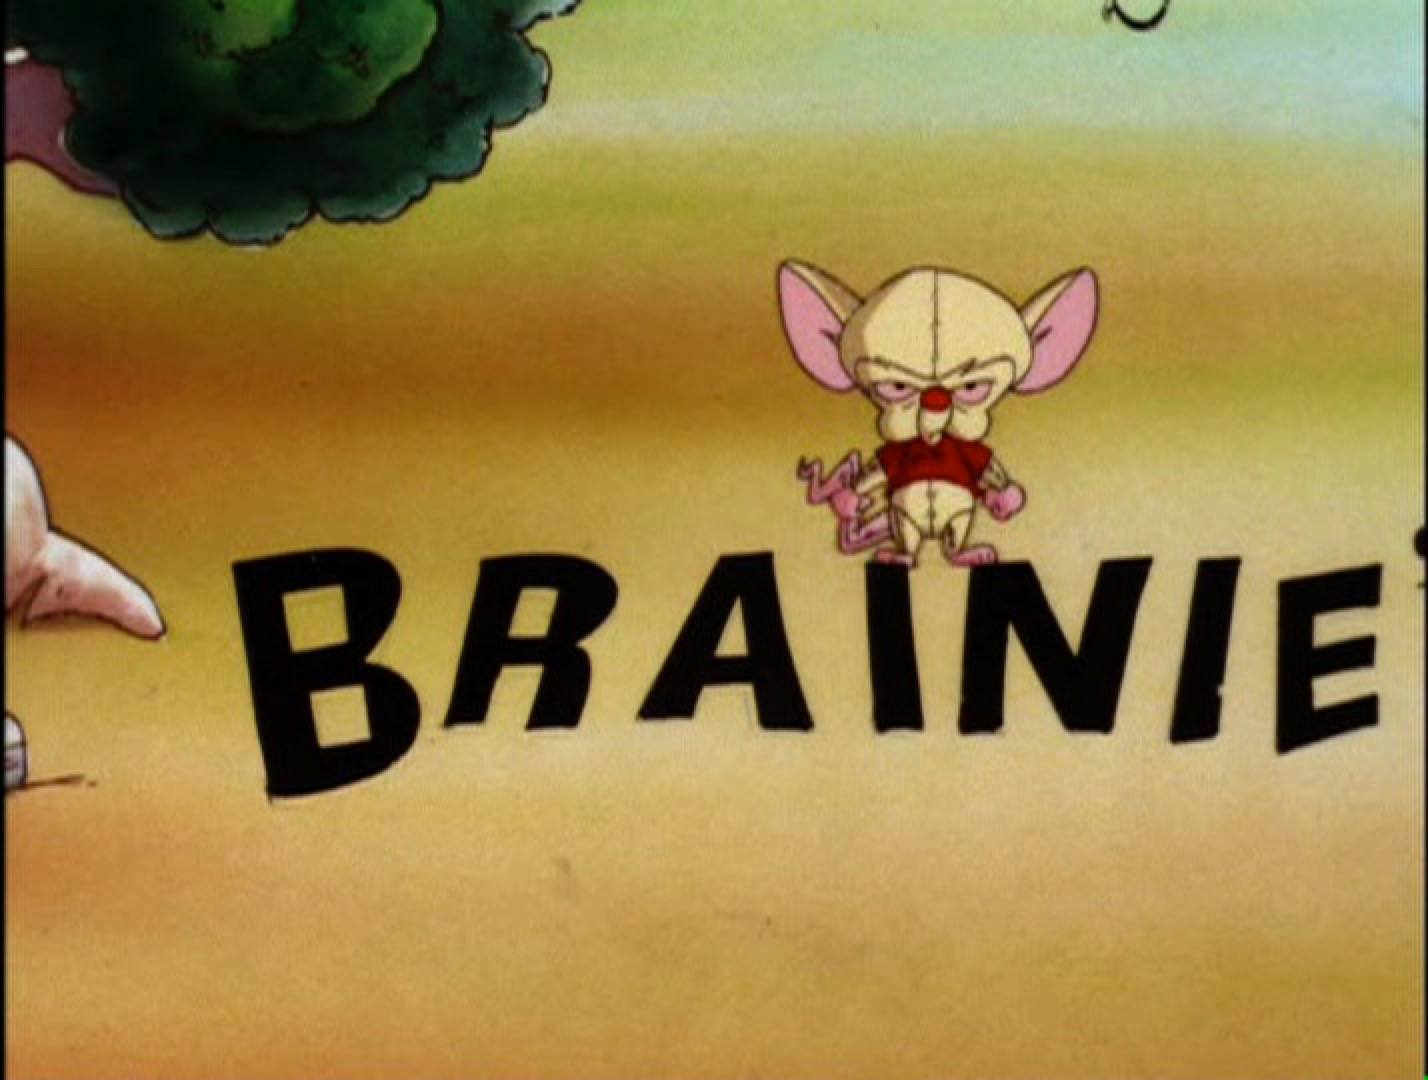 Brainie the Poo